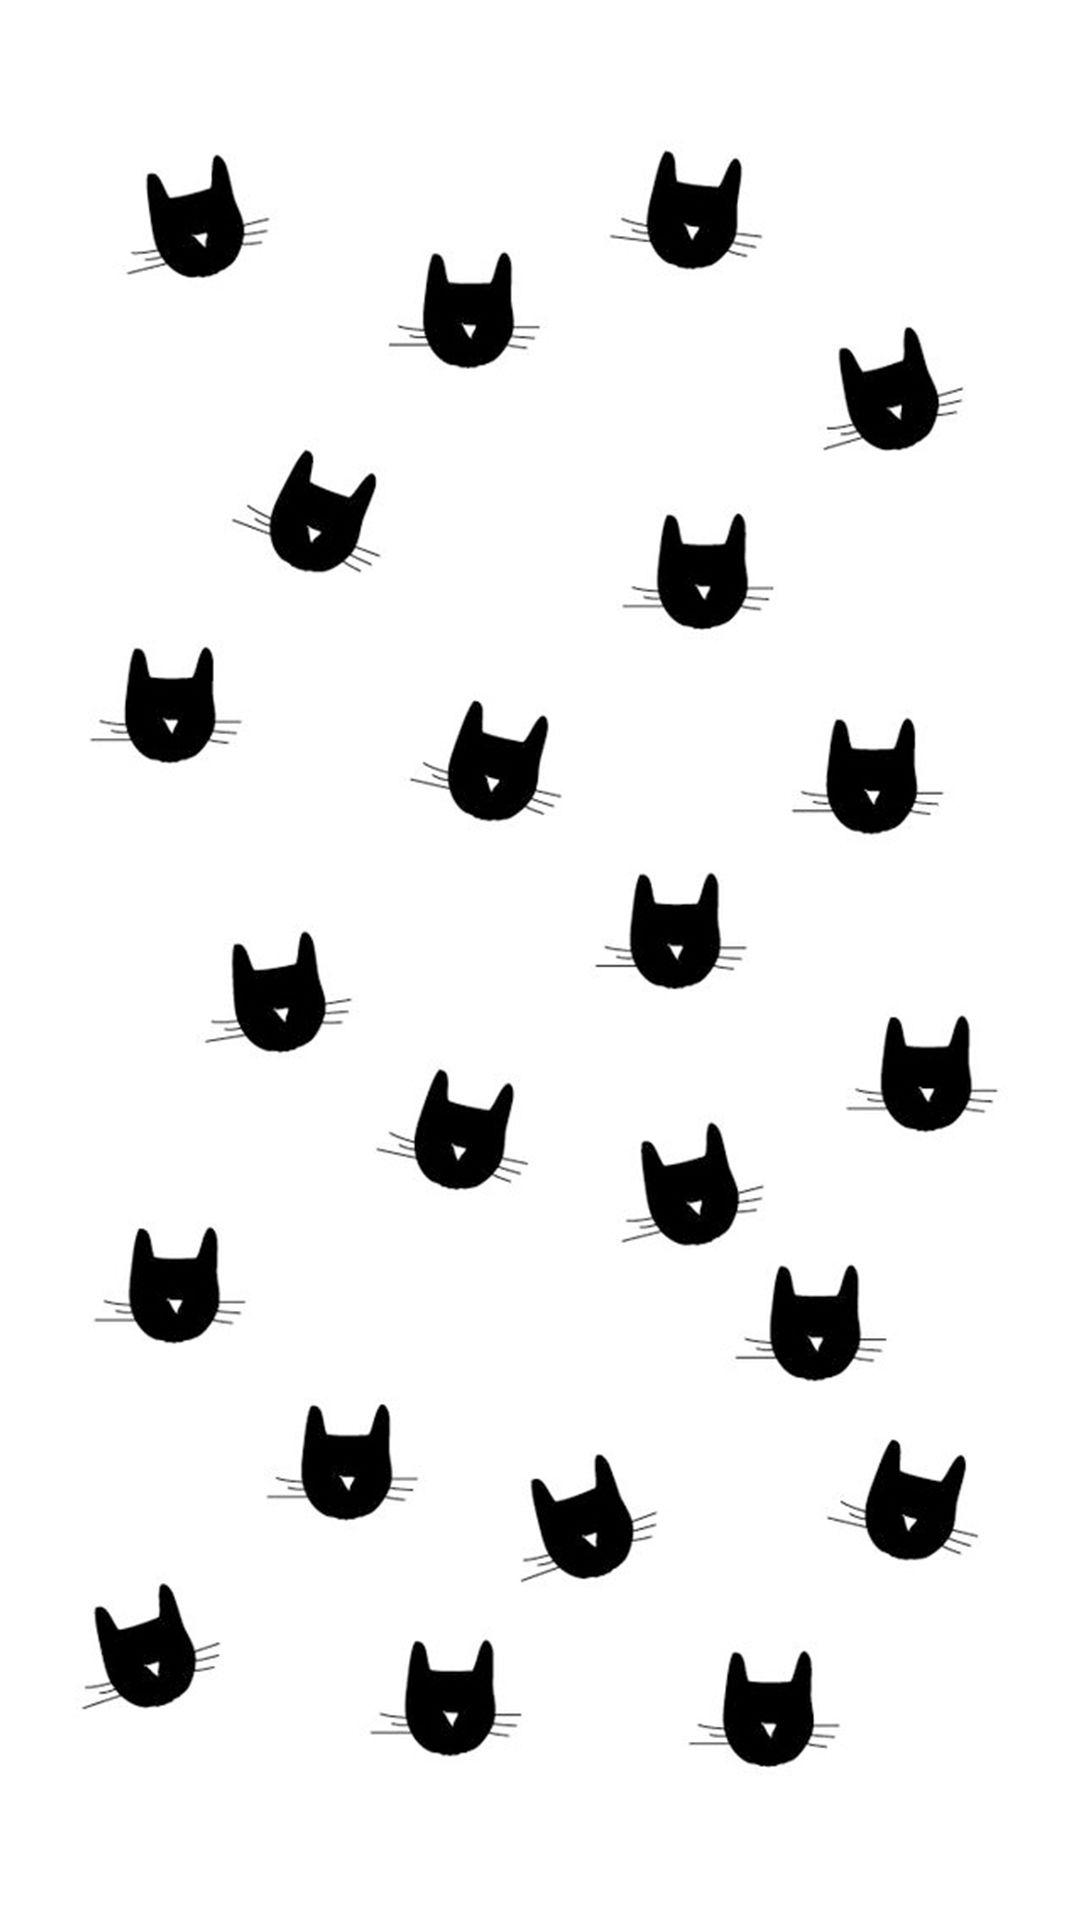 Cat Heads Pattern Iphone 6 Plus Wallpaper Cat Wallpaper Android Wallpaper Iphone Background